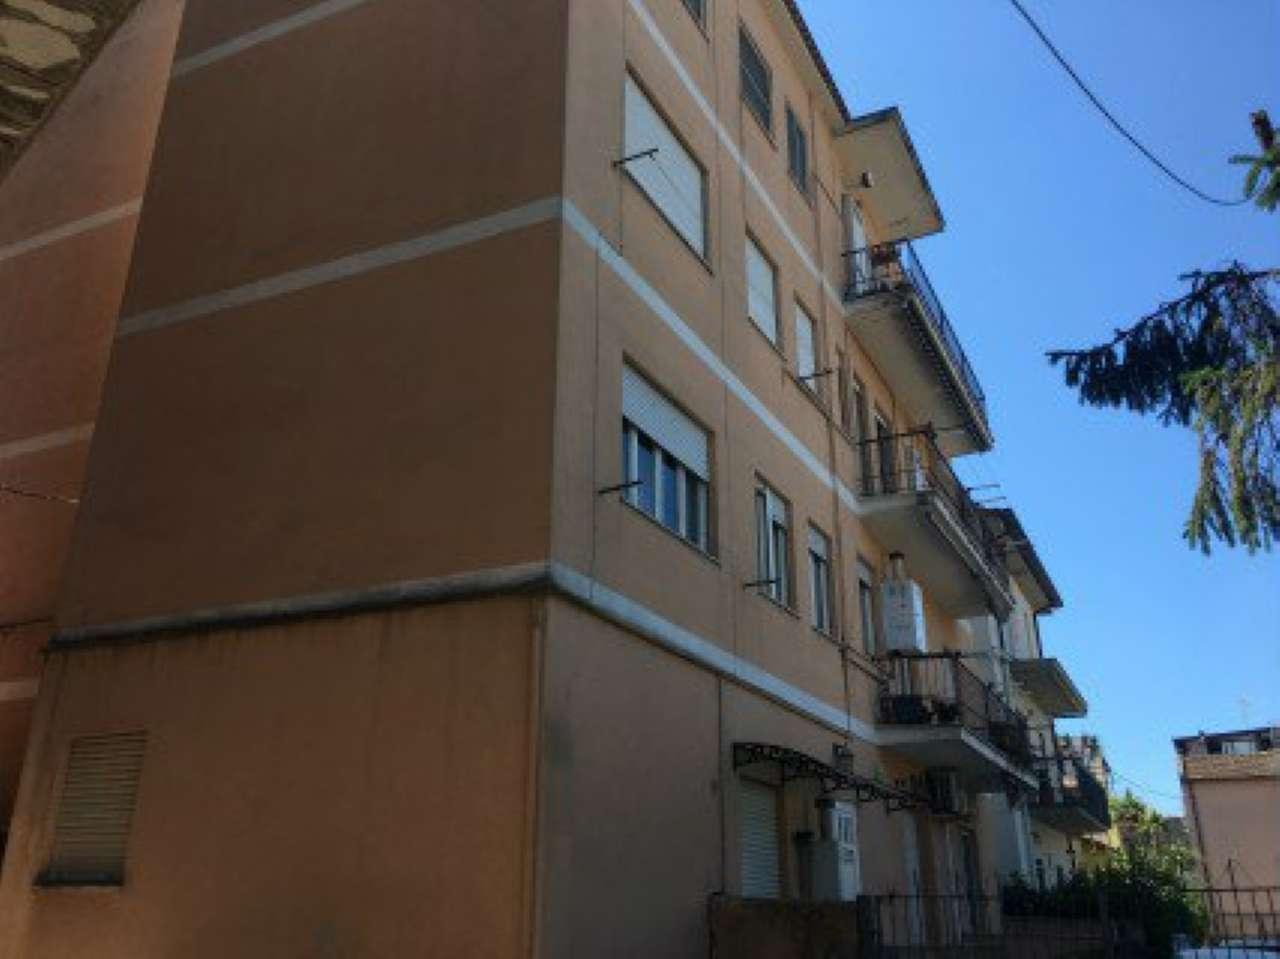 Bilocale, Via Don Morosini, Terracina, foto 0